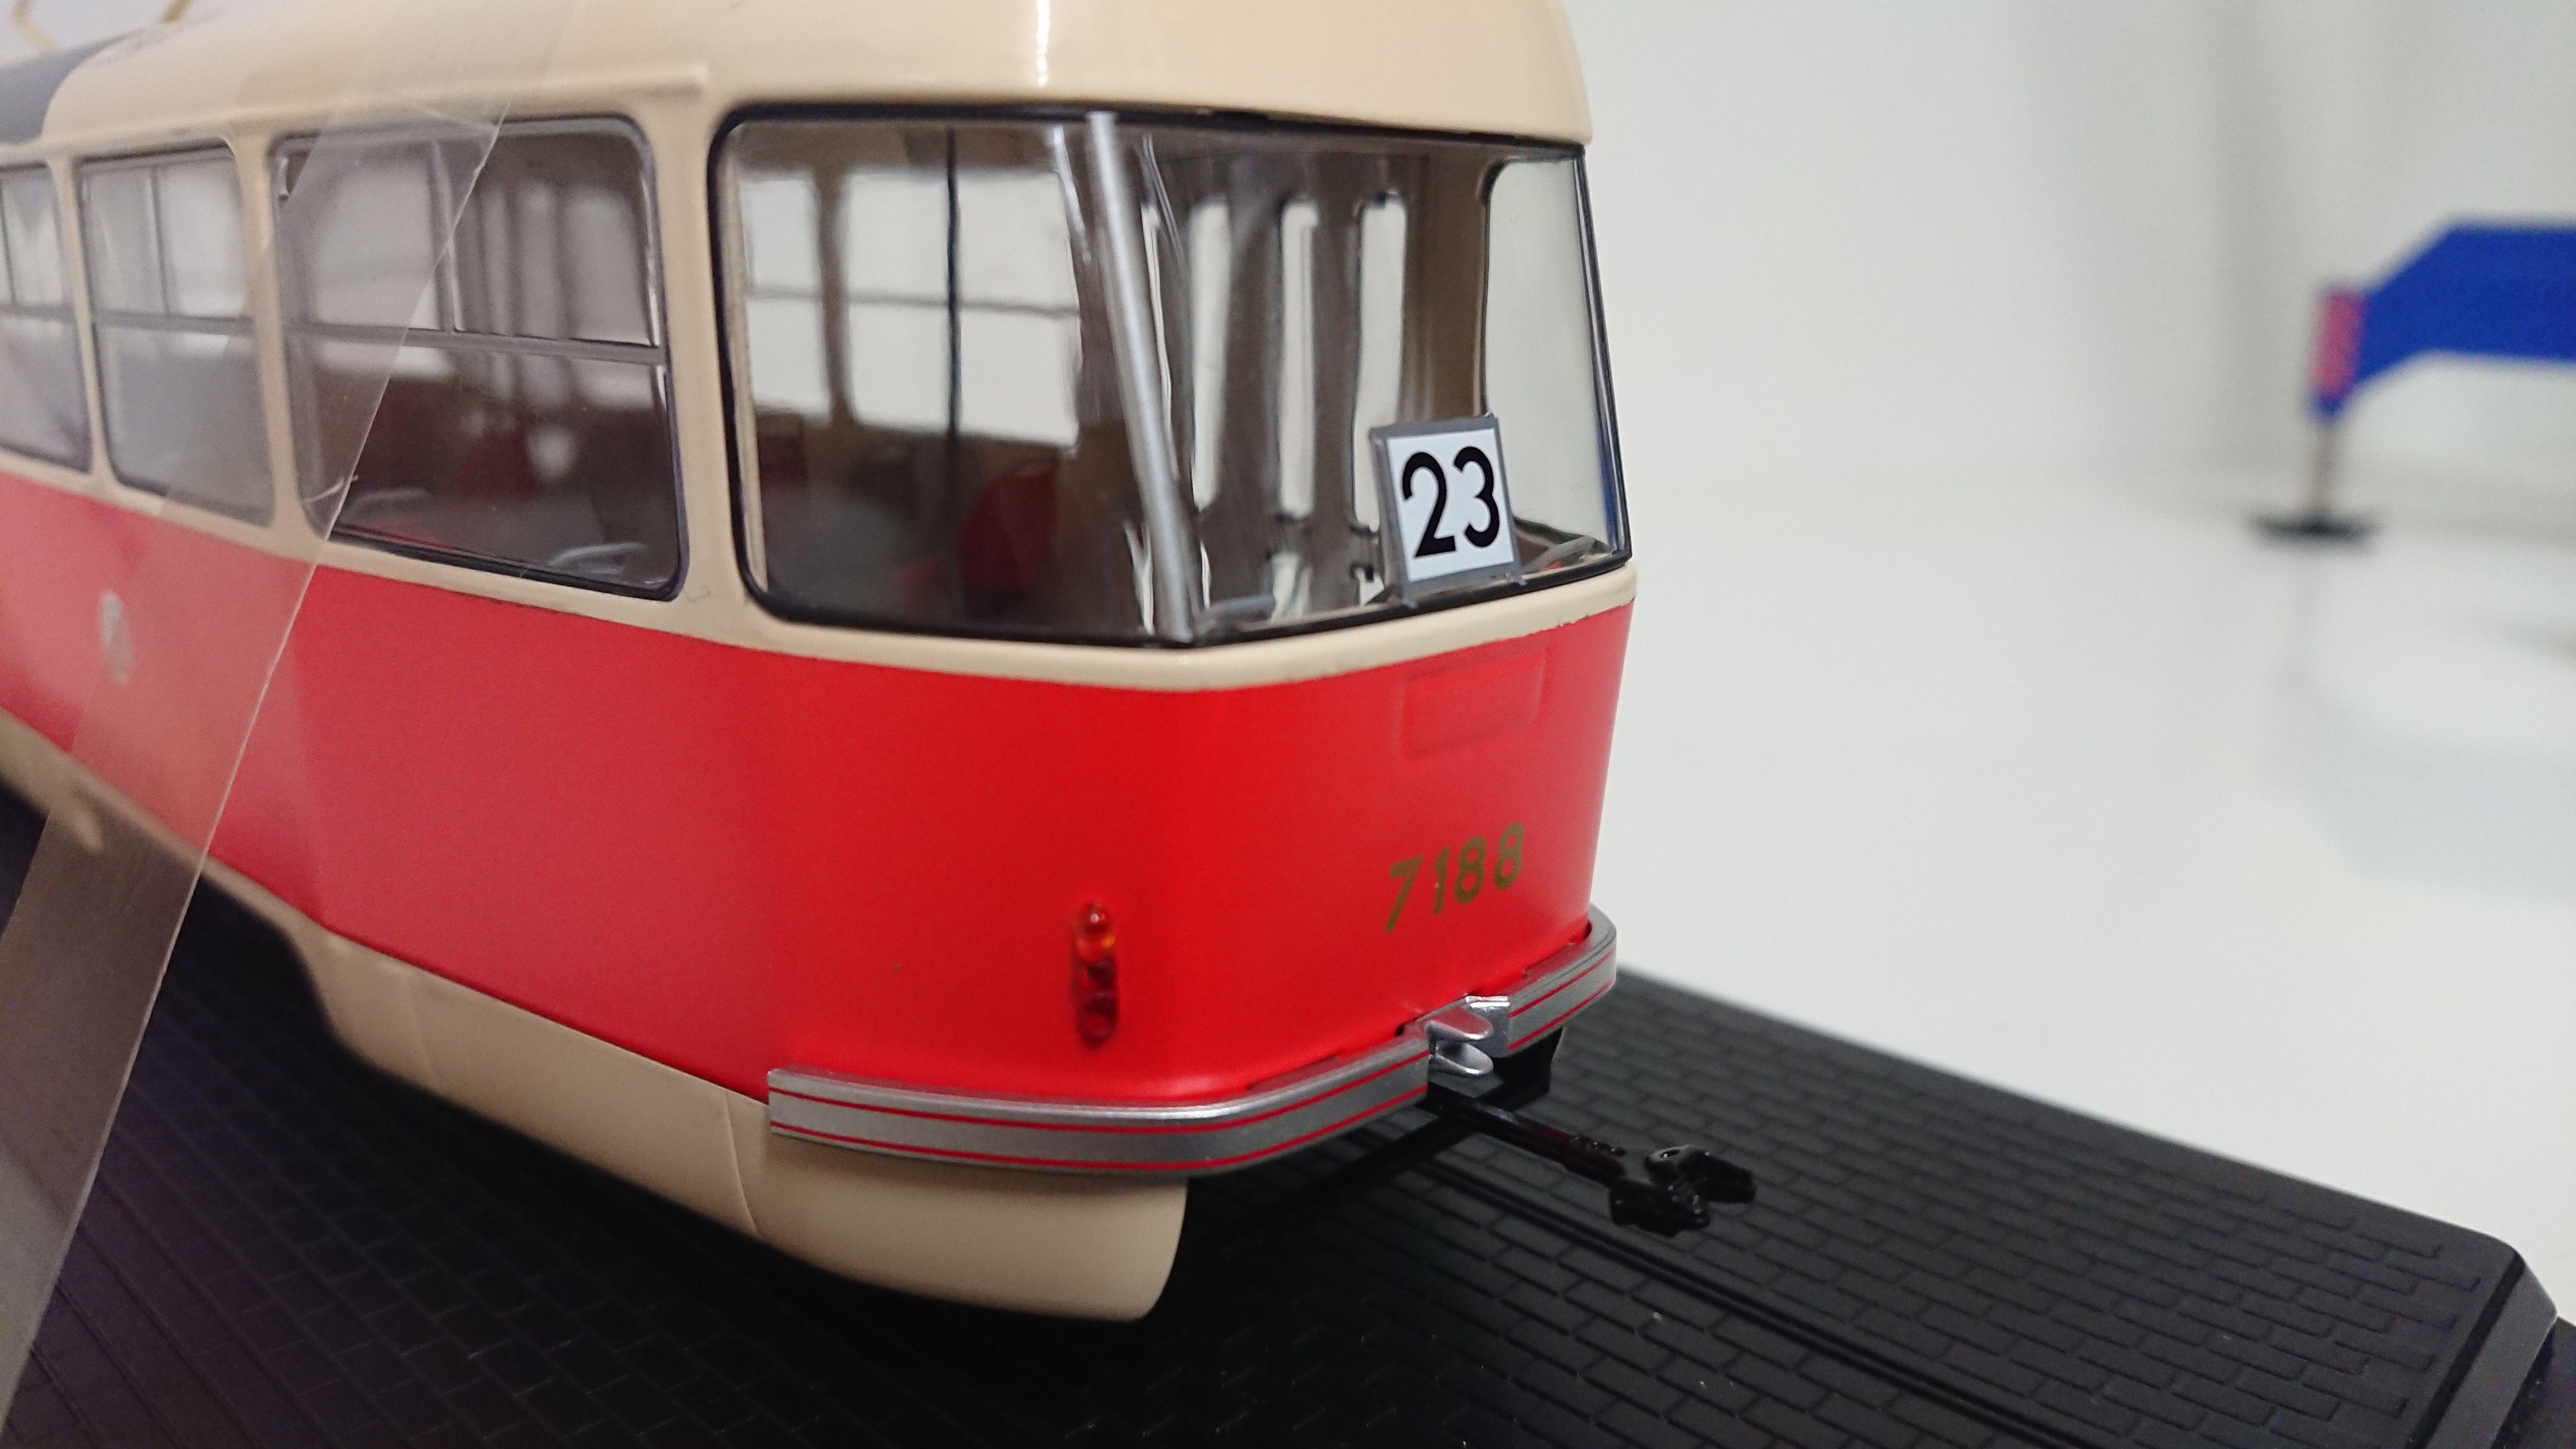 Macheta tramvai Tatra T3, scara 1:432